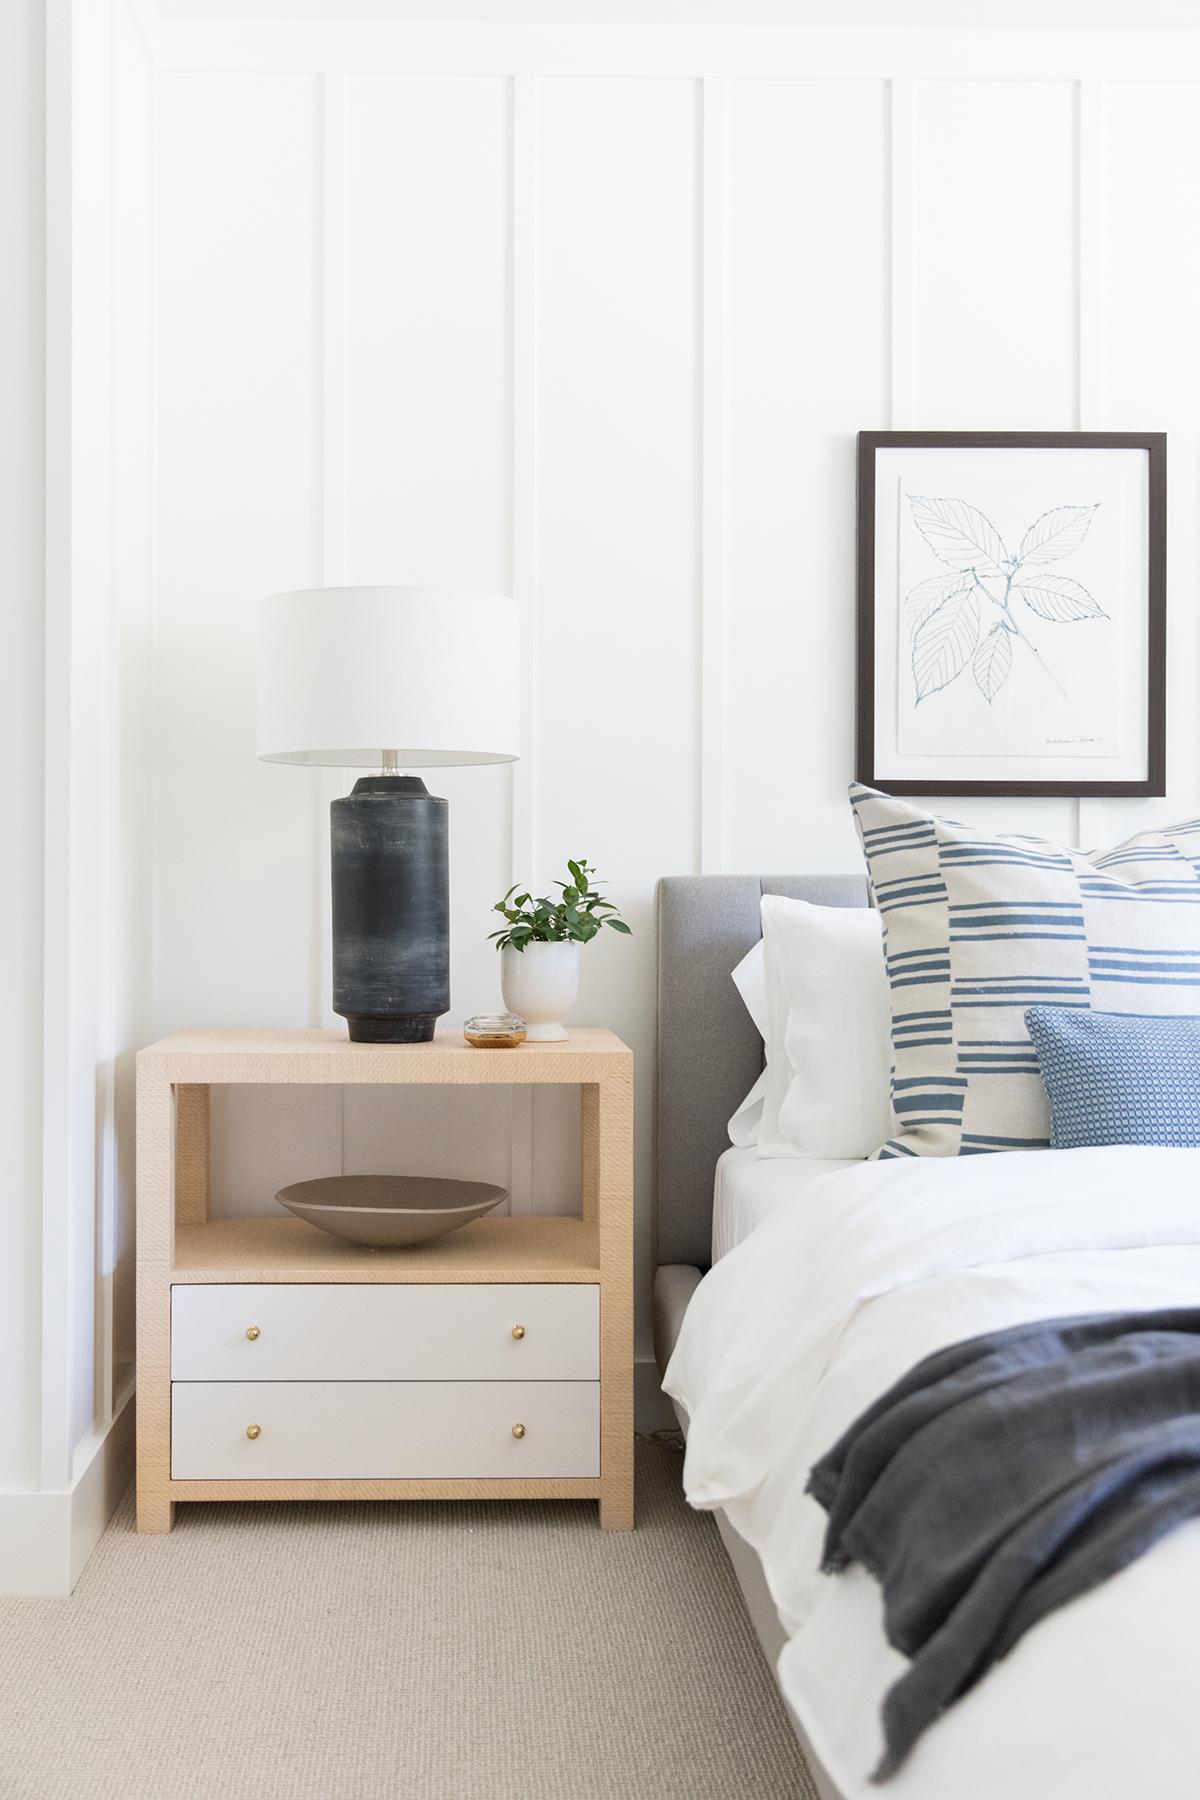 Natural,+textured+bedroom+with+fort+batten+wall+detail+_+Studio+McGee+Blog-3.jpg